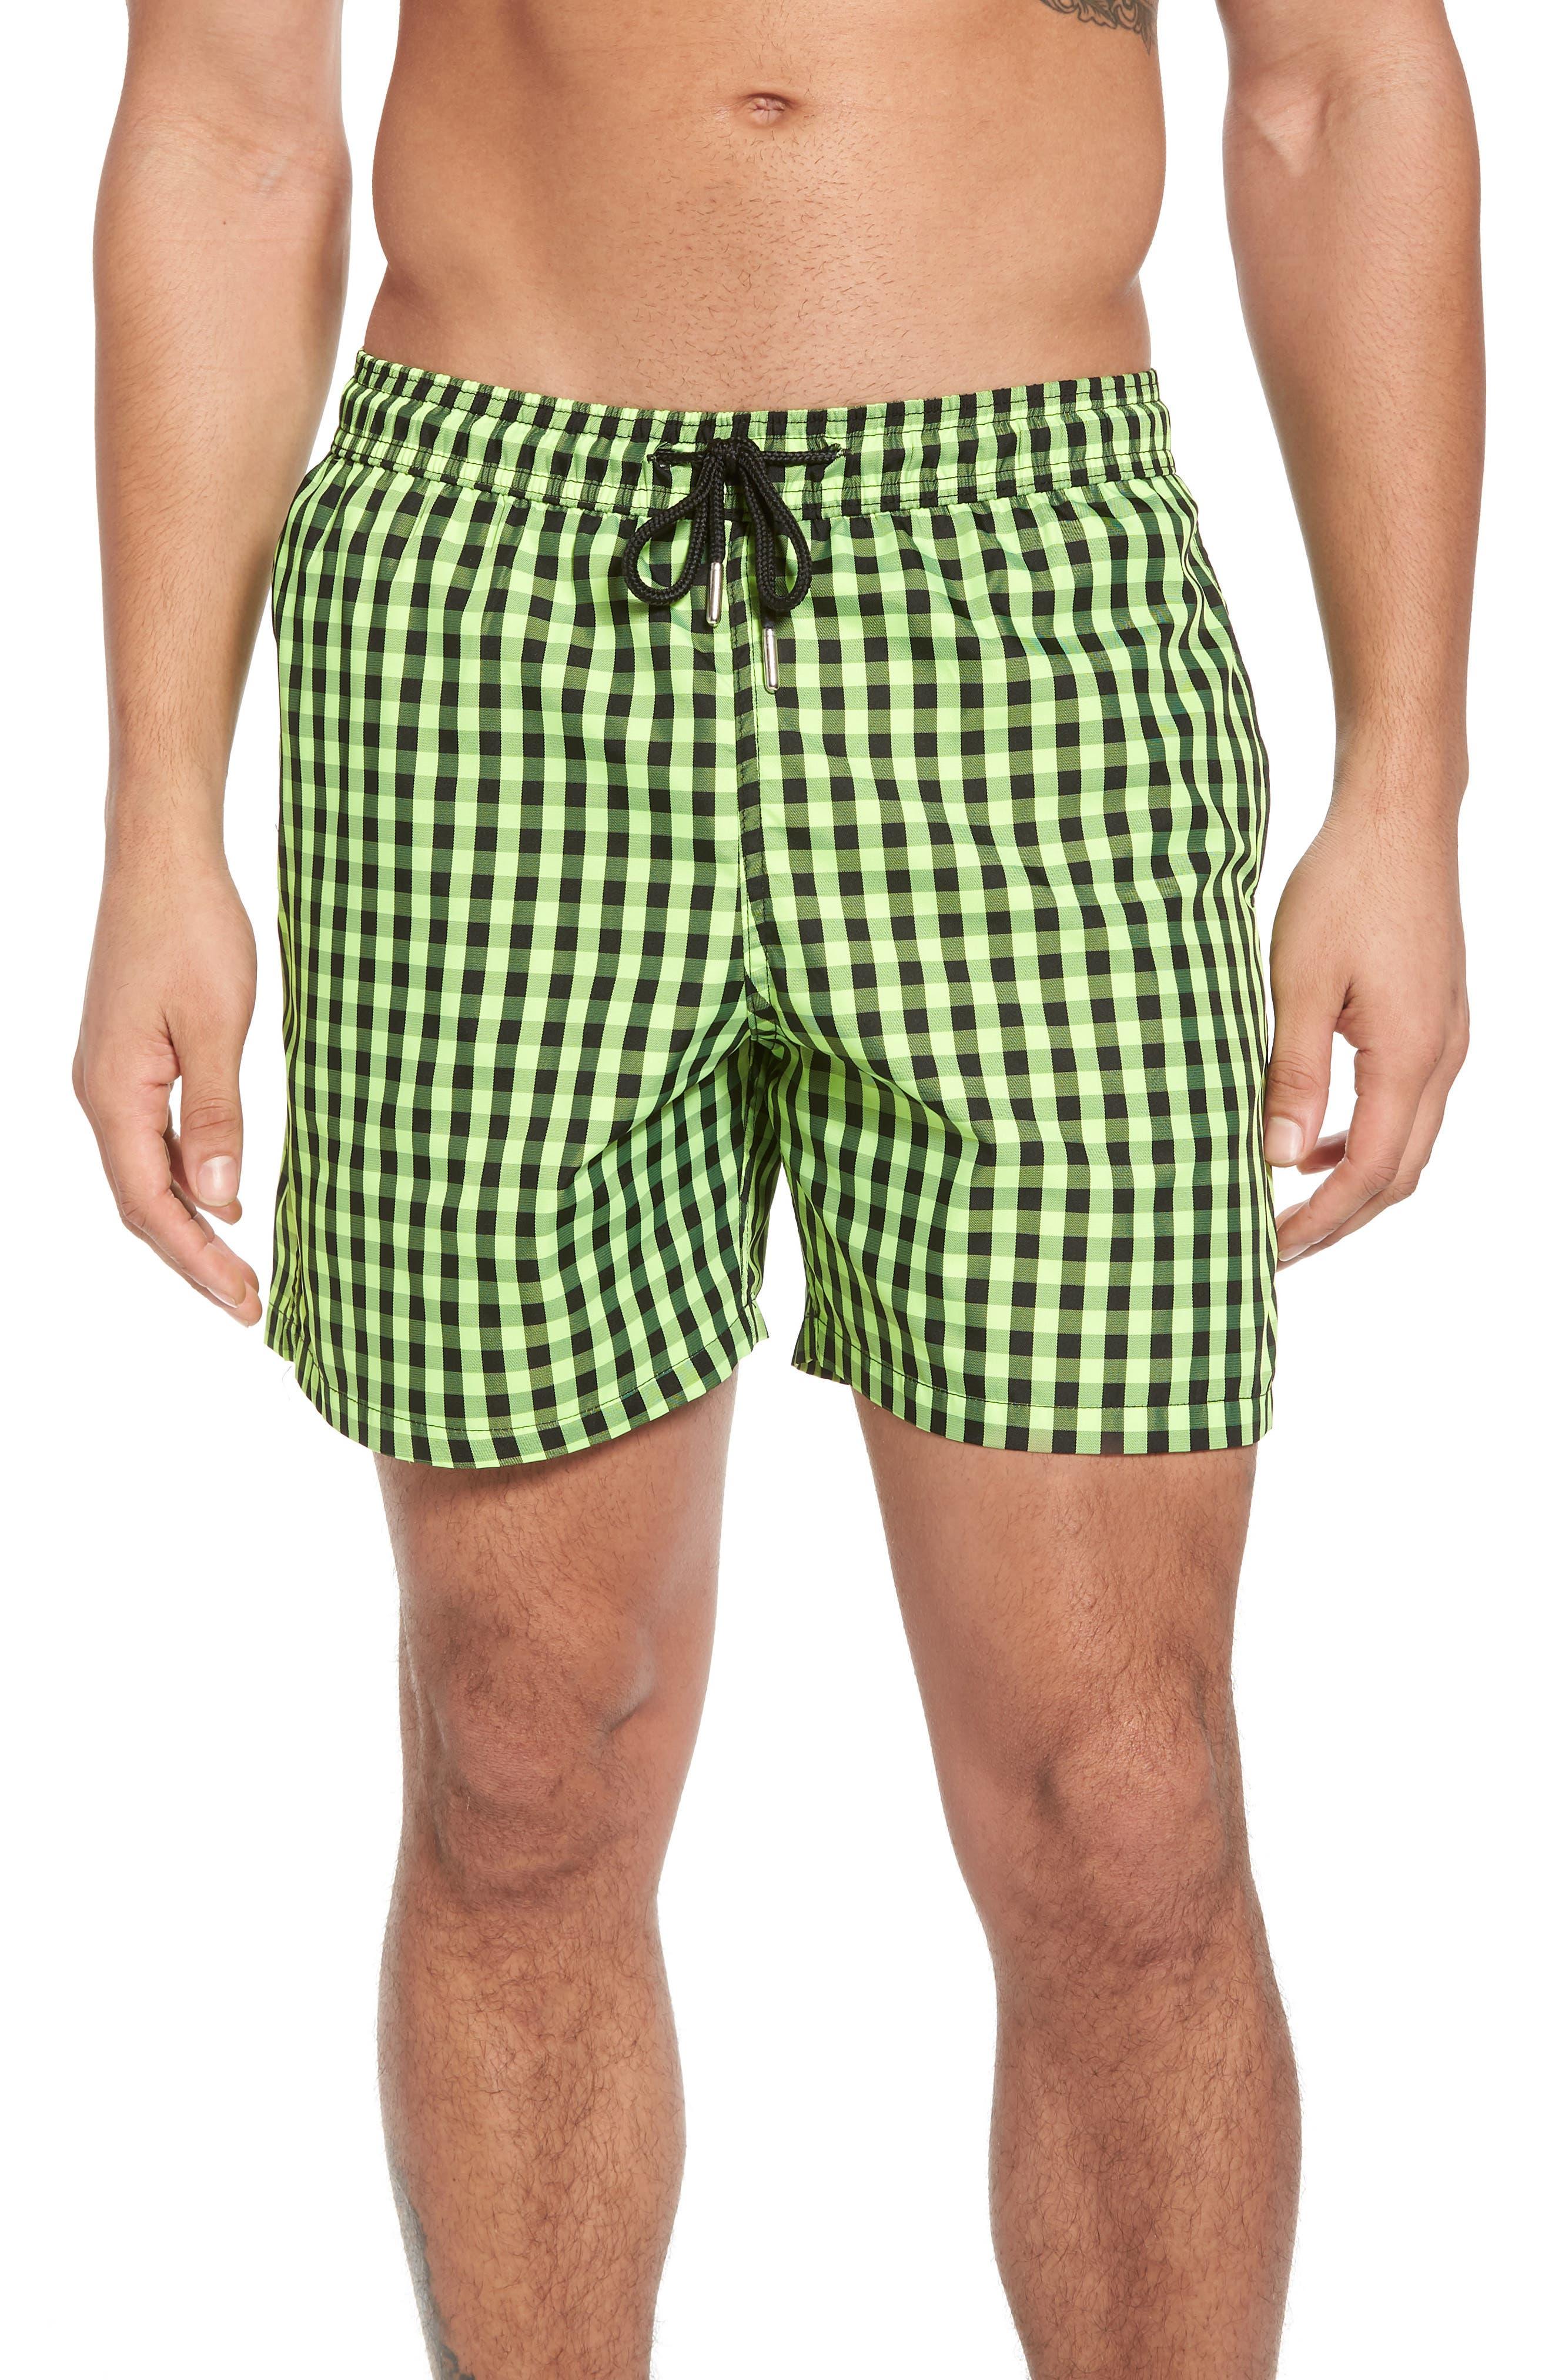 Trim Fit Swim Shorts,                             Main thumbnail 1, color,                             300